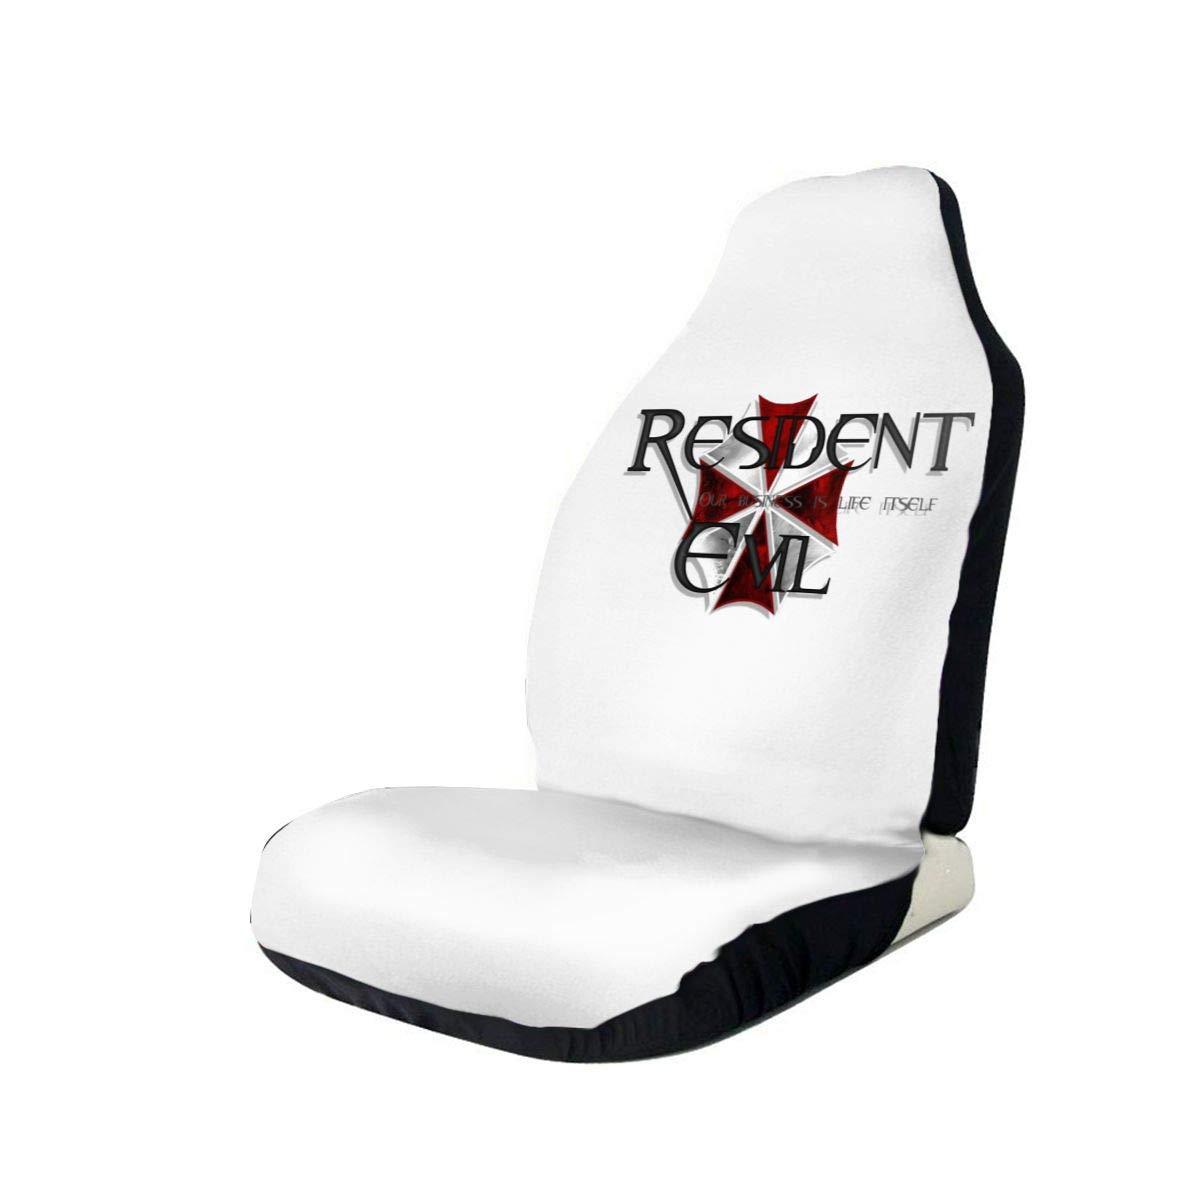 Umbrella Resident Evil Car Seat Covers Car Seat Protector Covers ,Fit Most Cars, Sedan, SUV,Van